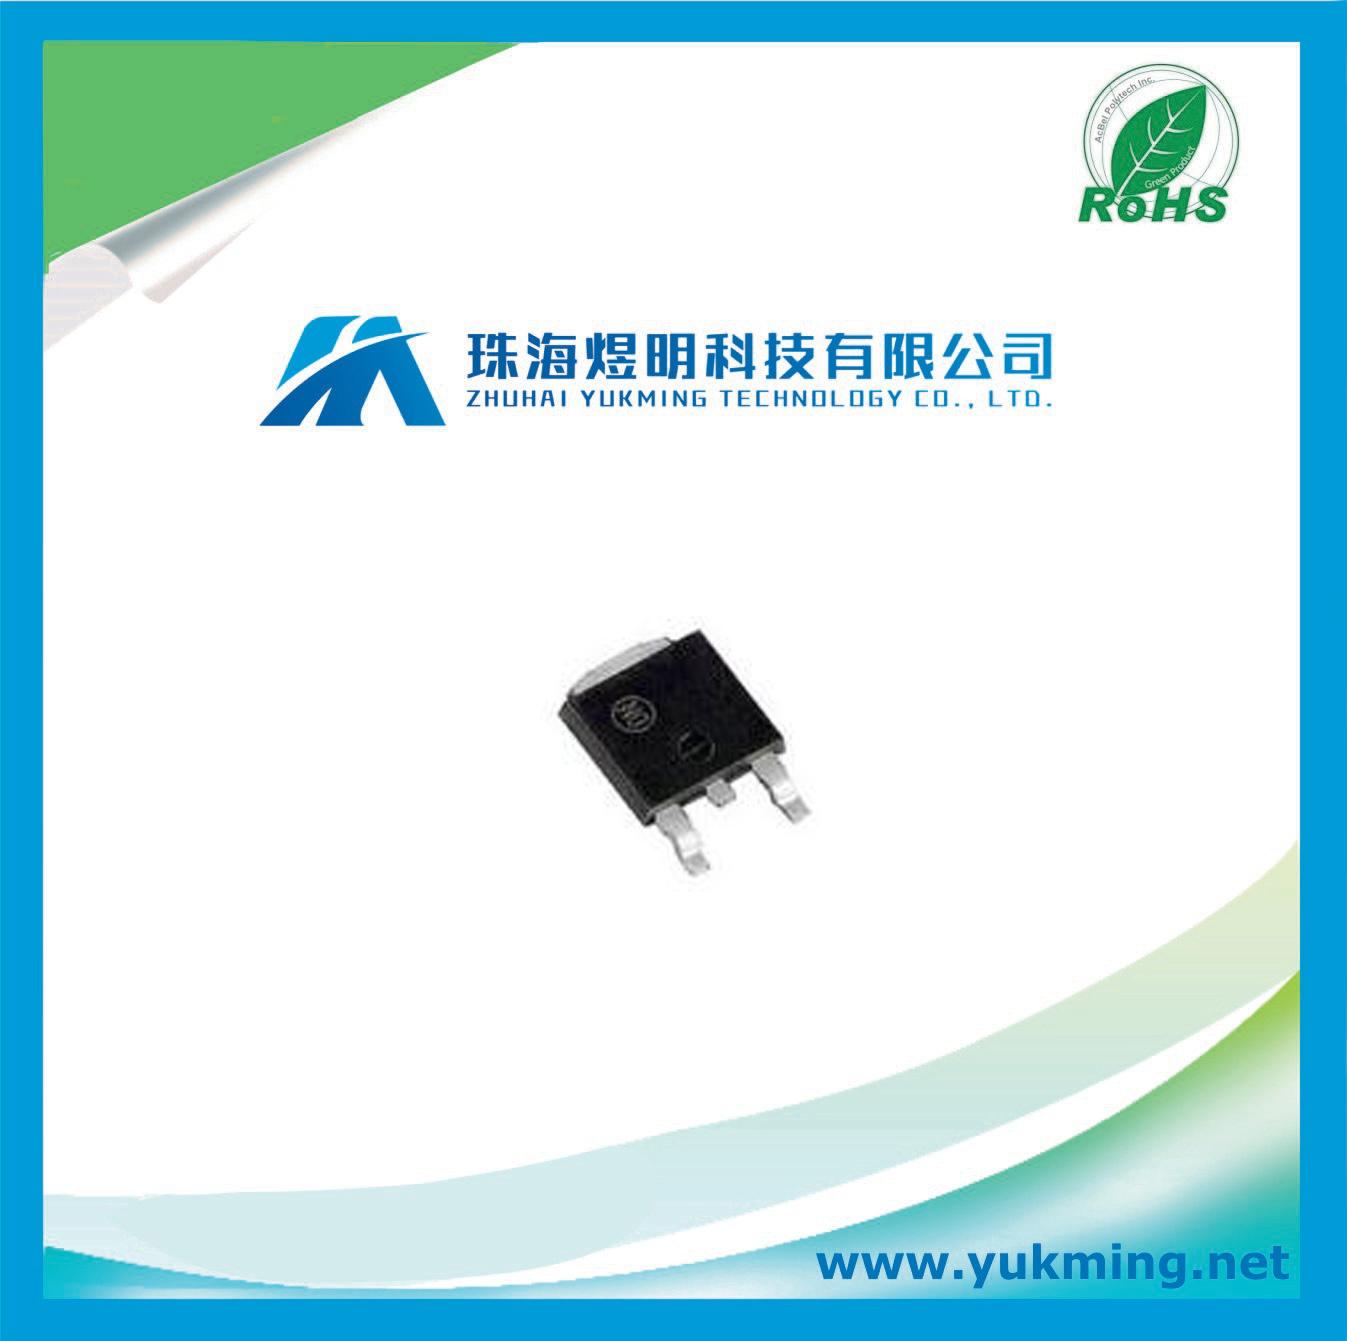 Integrated Circuit Mc78m05cdtrkg of Standard Linear Regulator IC